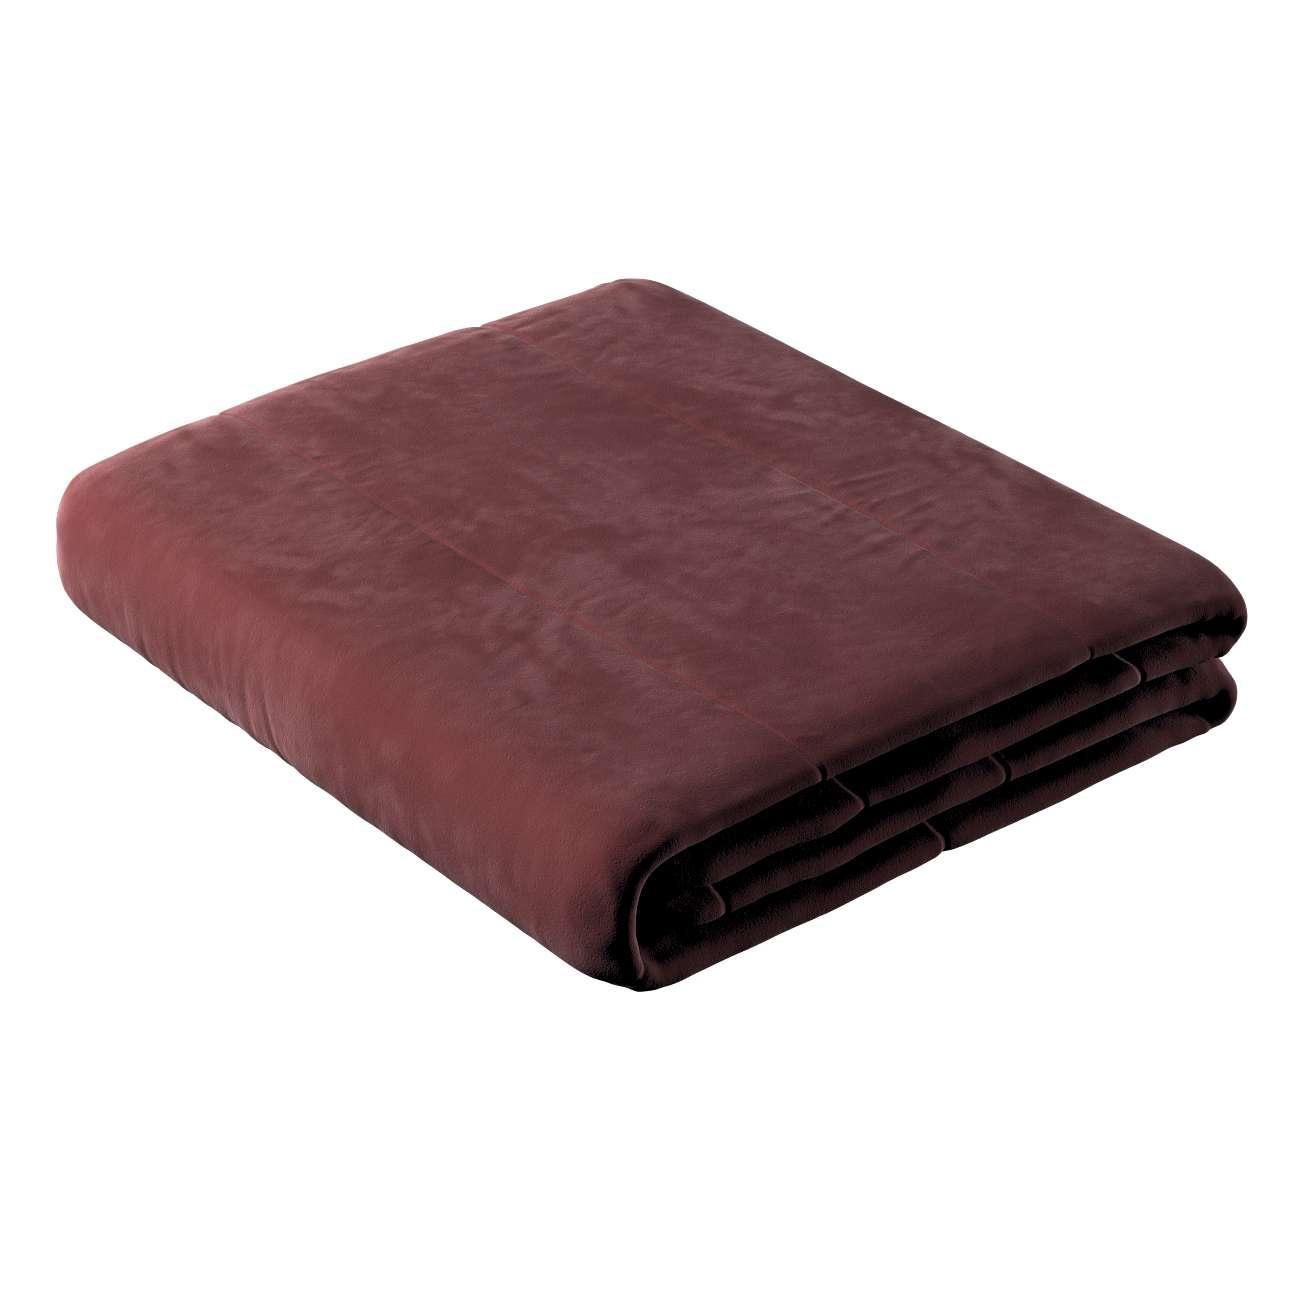 Zamatový prehoz Velvet V kolekcii Velvet, tkanina: 704-26